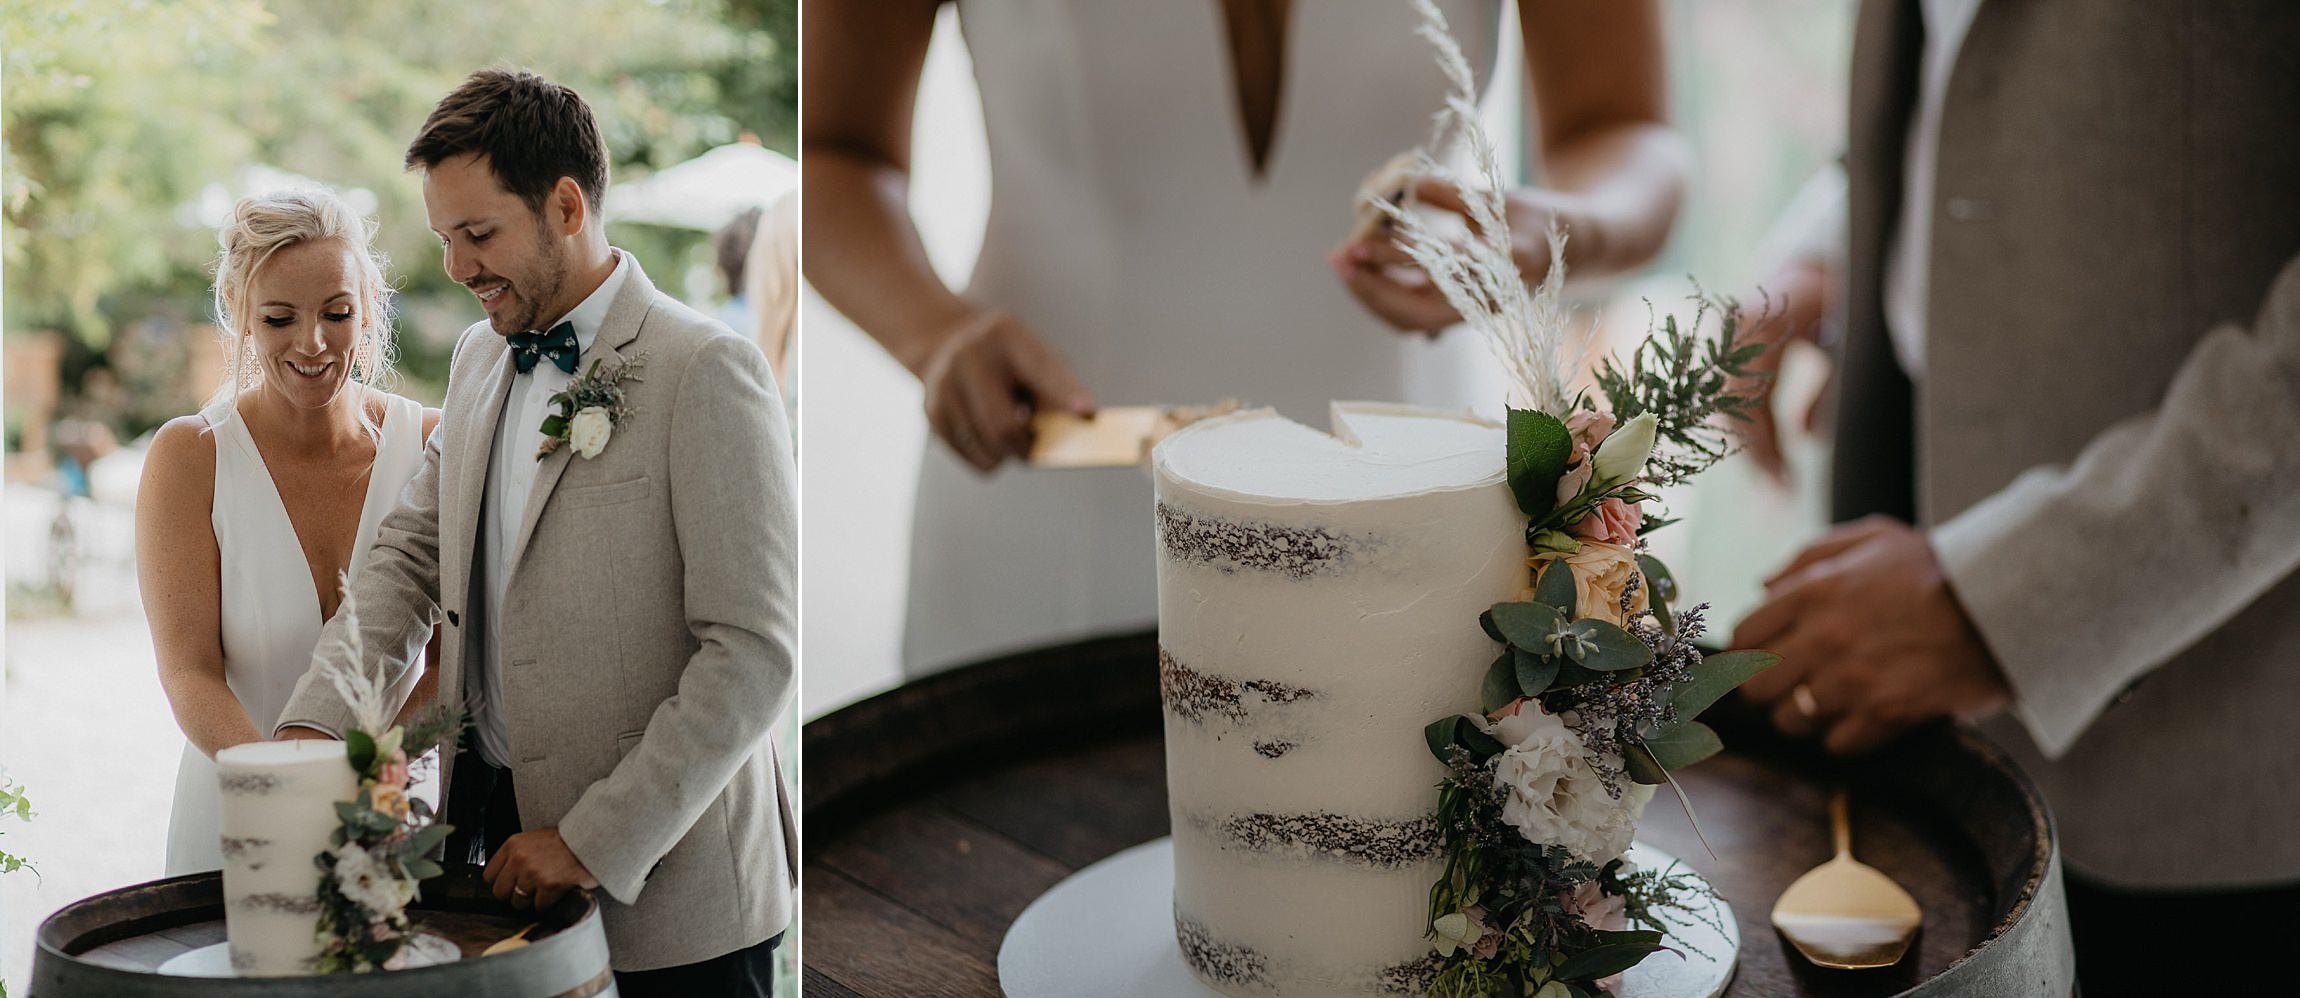 oldforestschool-wedding-blog-175.jpg